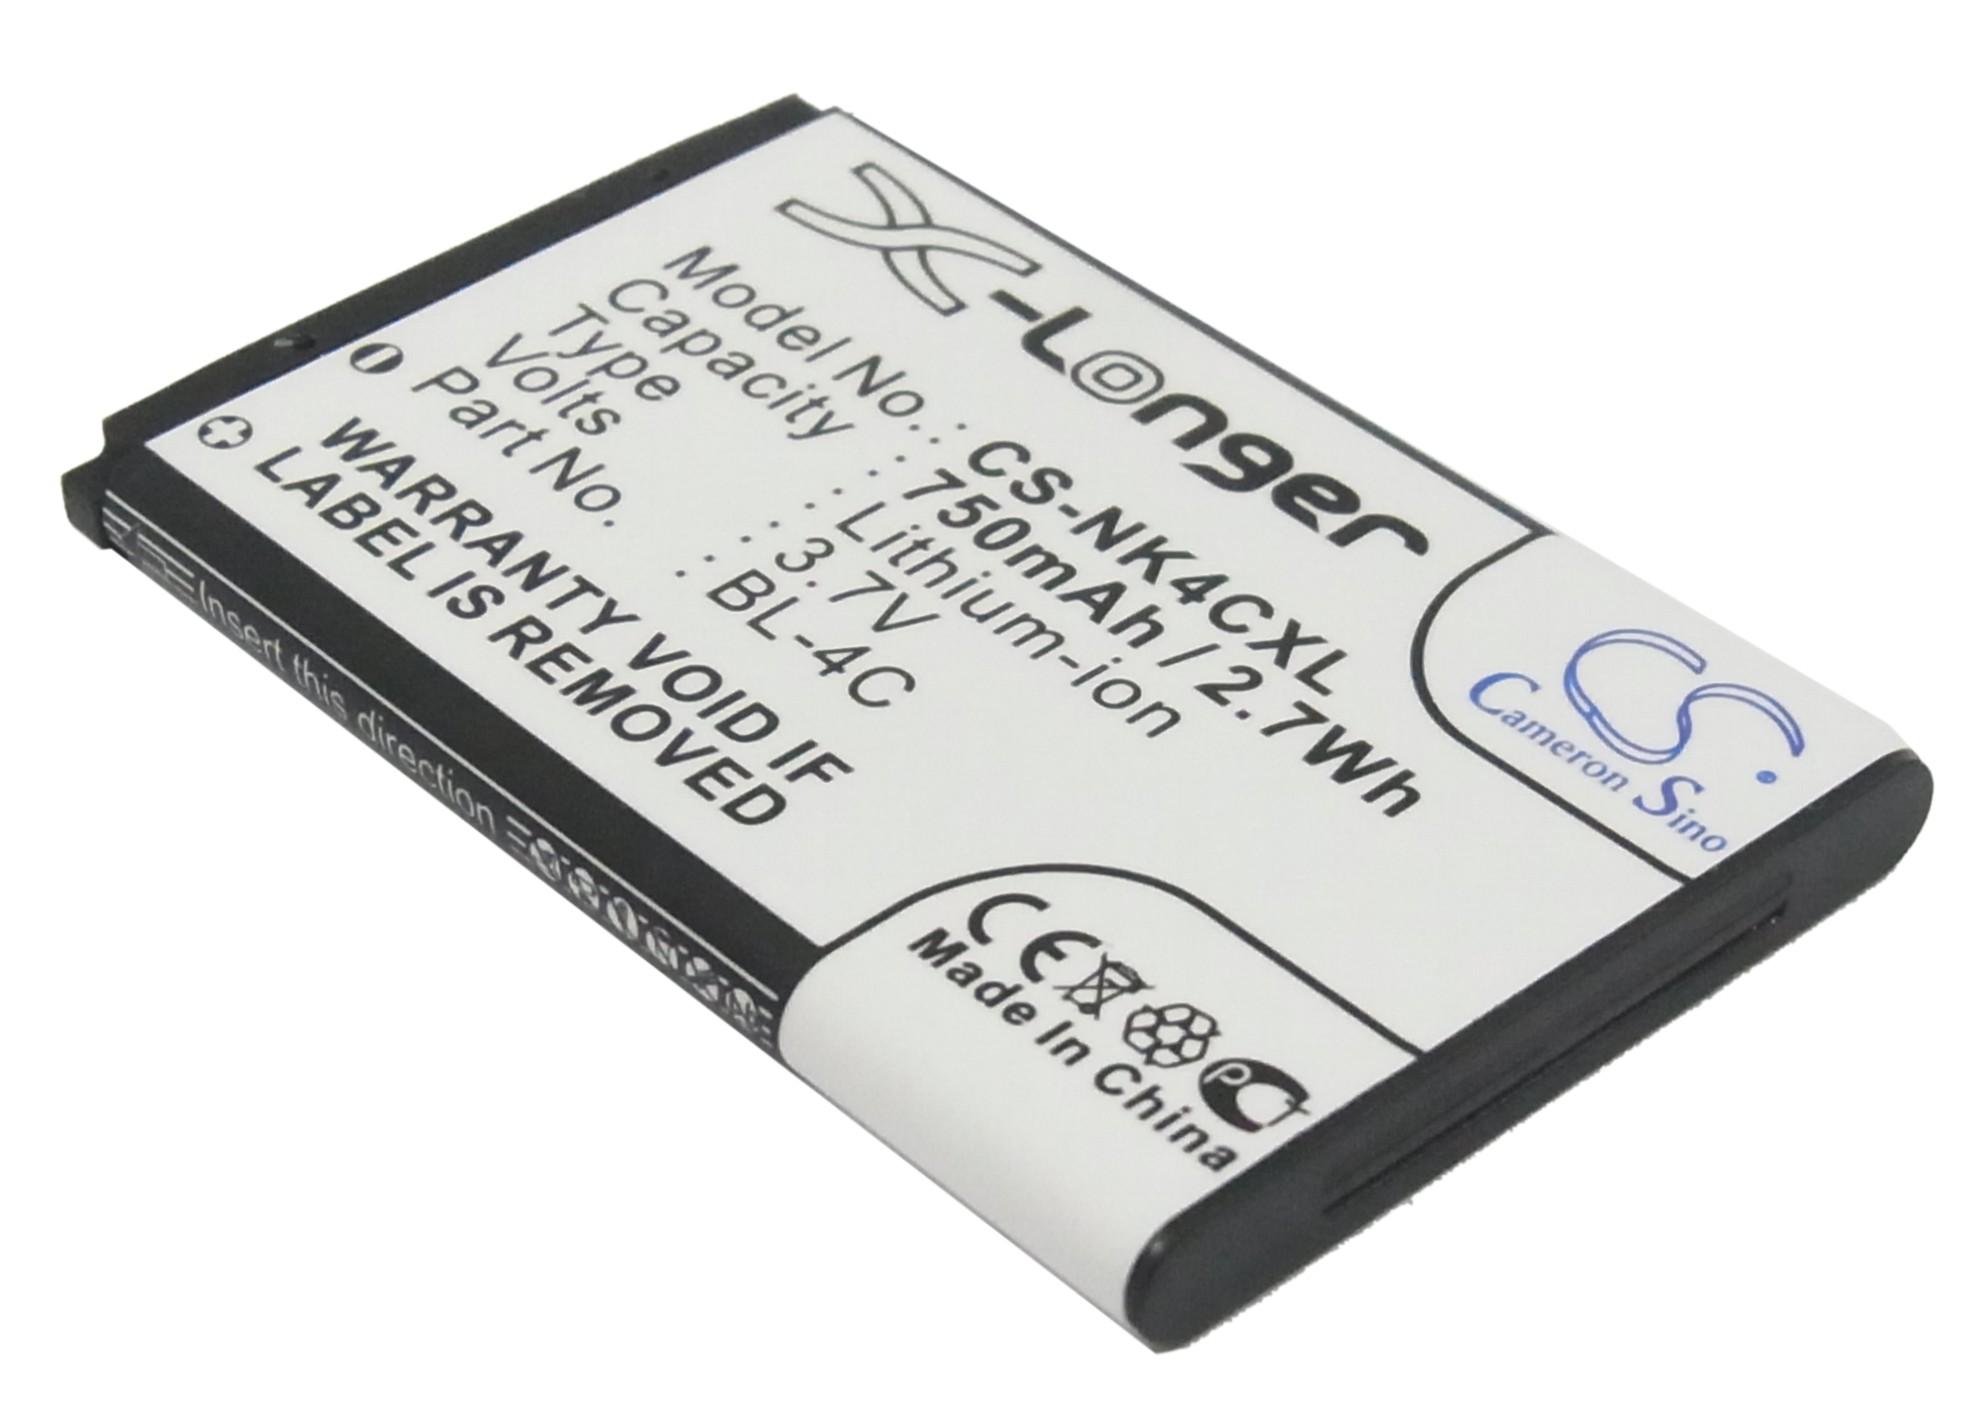 Cameron Sino baterie do mobilů pro NOKIA 6170 3.7V Li-ion 750mAh černá - neoriginální